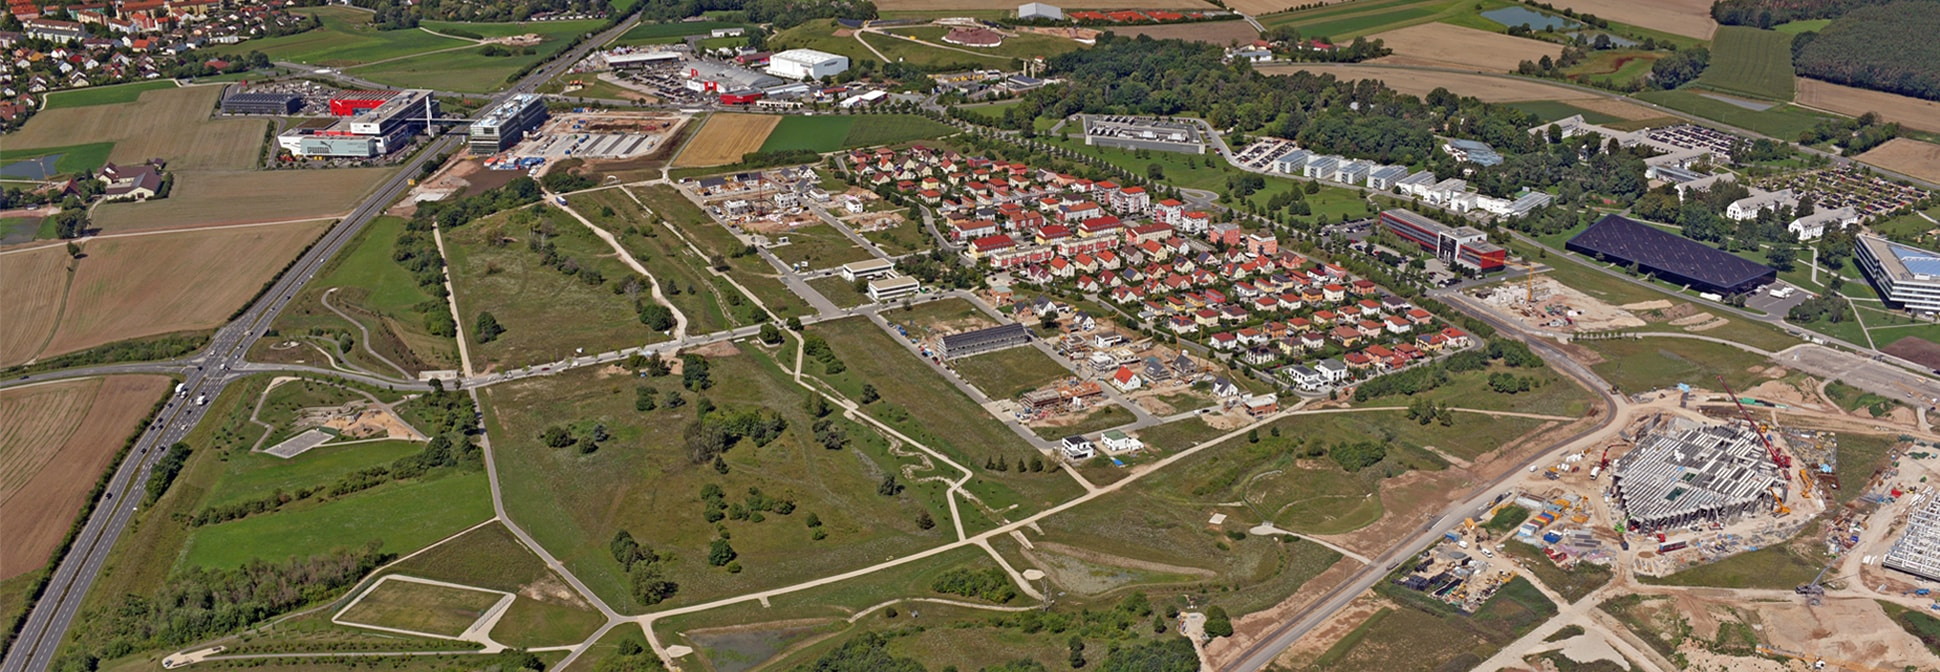 Wohnpark Herzo Base BA II, Herzogenaurach